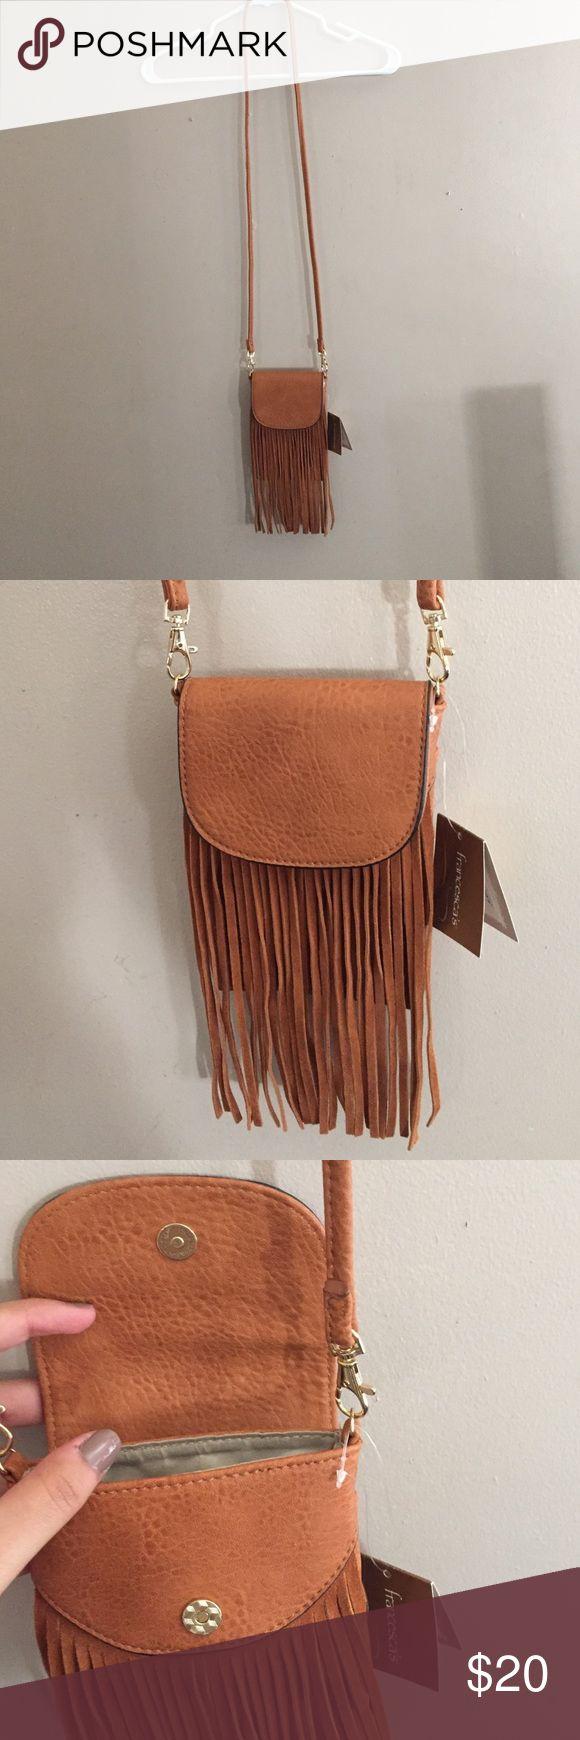 Francesca's Fringe Festival Bag NWT Cute fringe tan leather bag. Very cute Francesca's Collections Bags